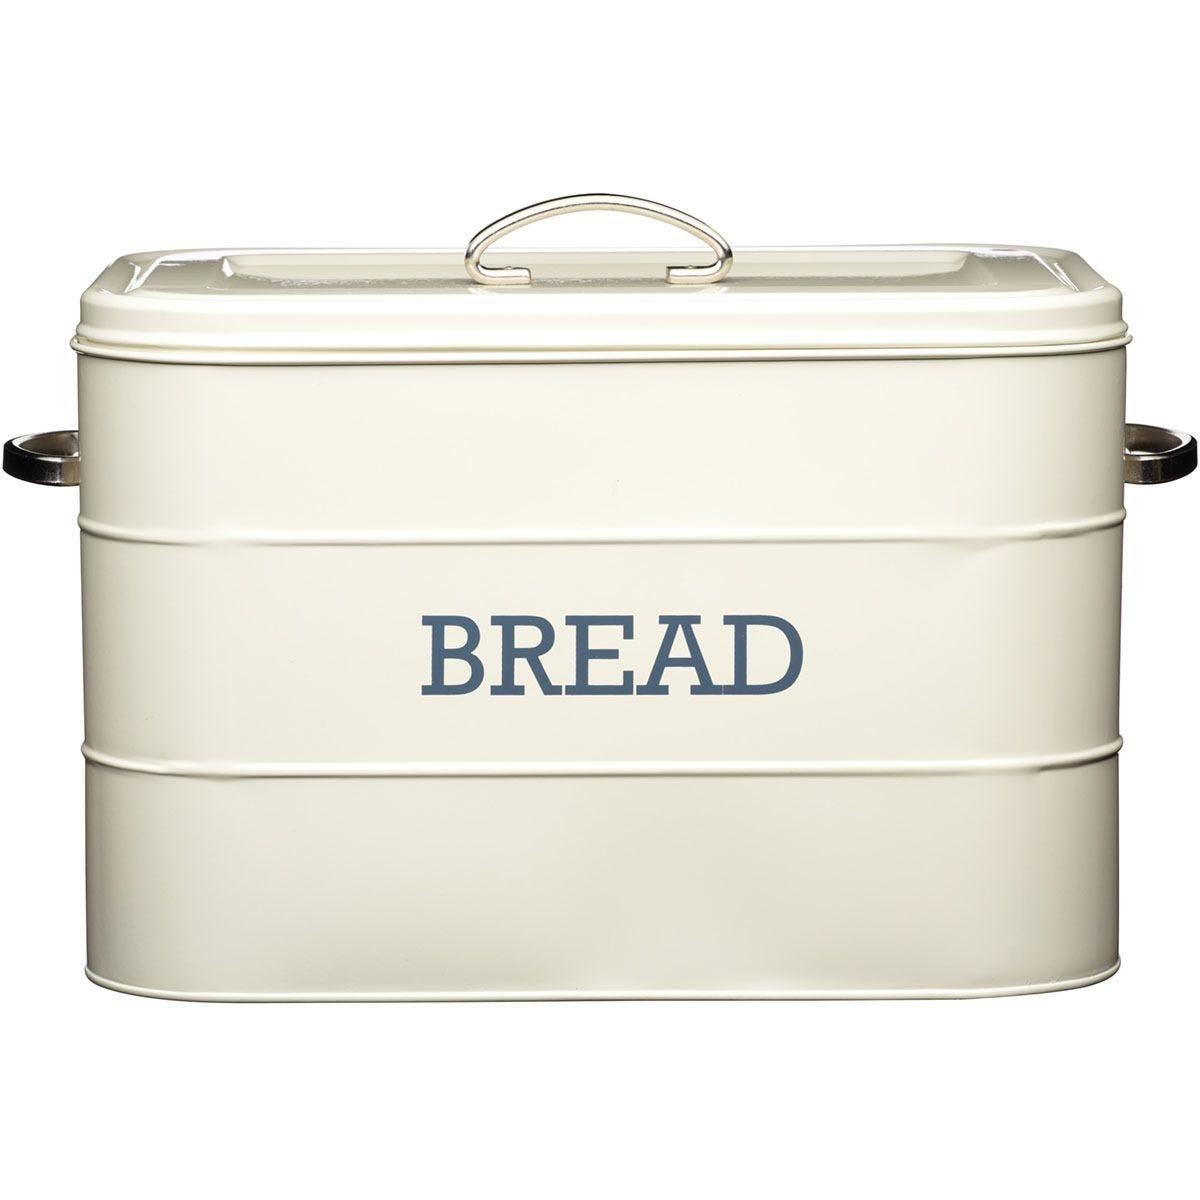 KitchenCraft Living Nostalgia Bread Bin - Cream